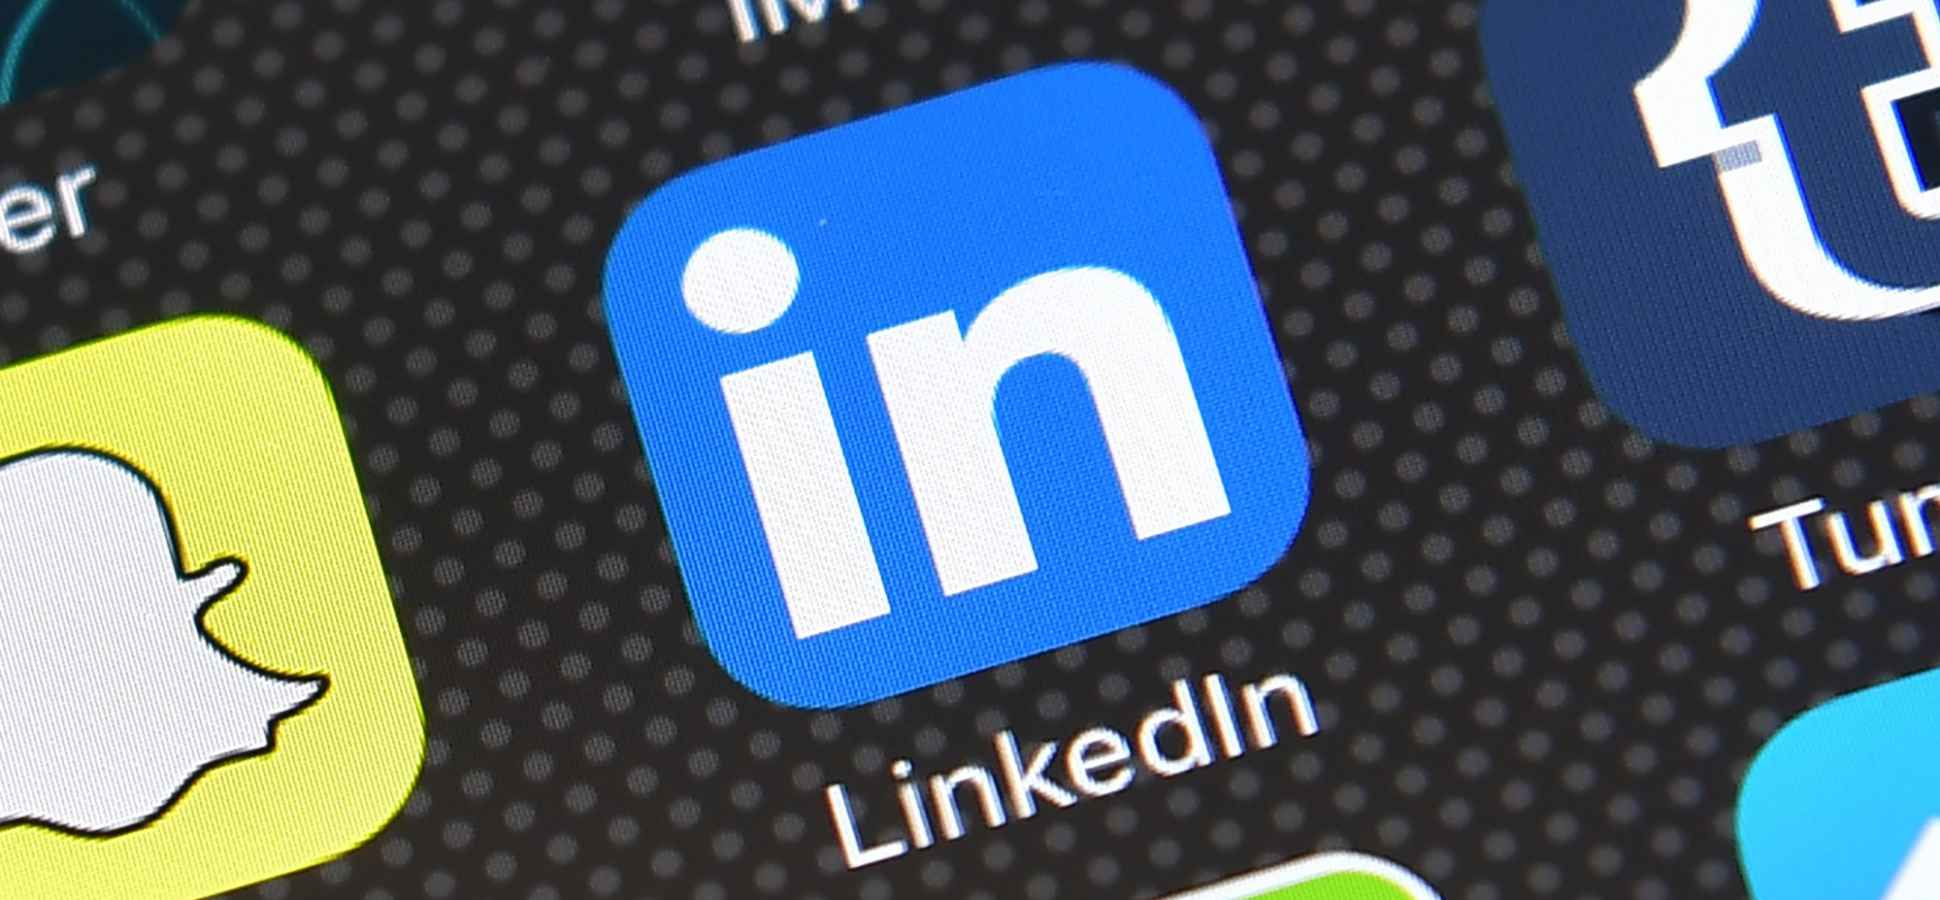 LinkedIn Just Gave Away a Big Secret